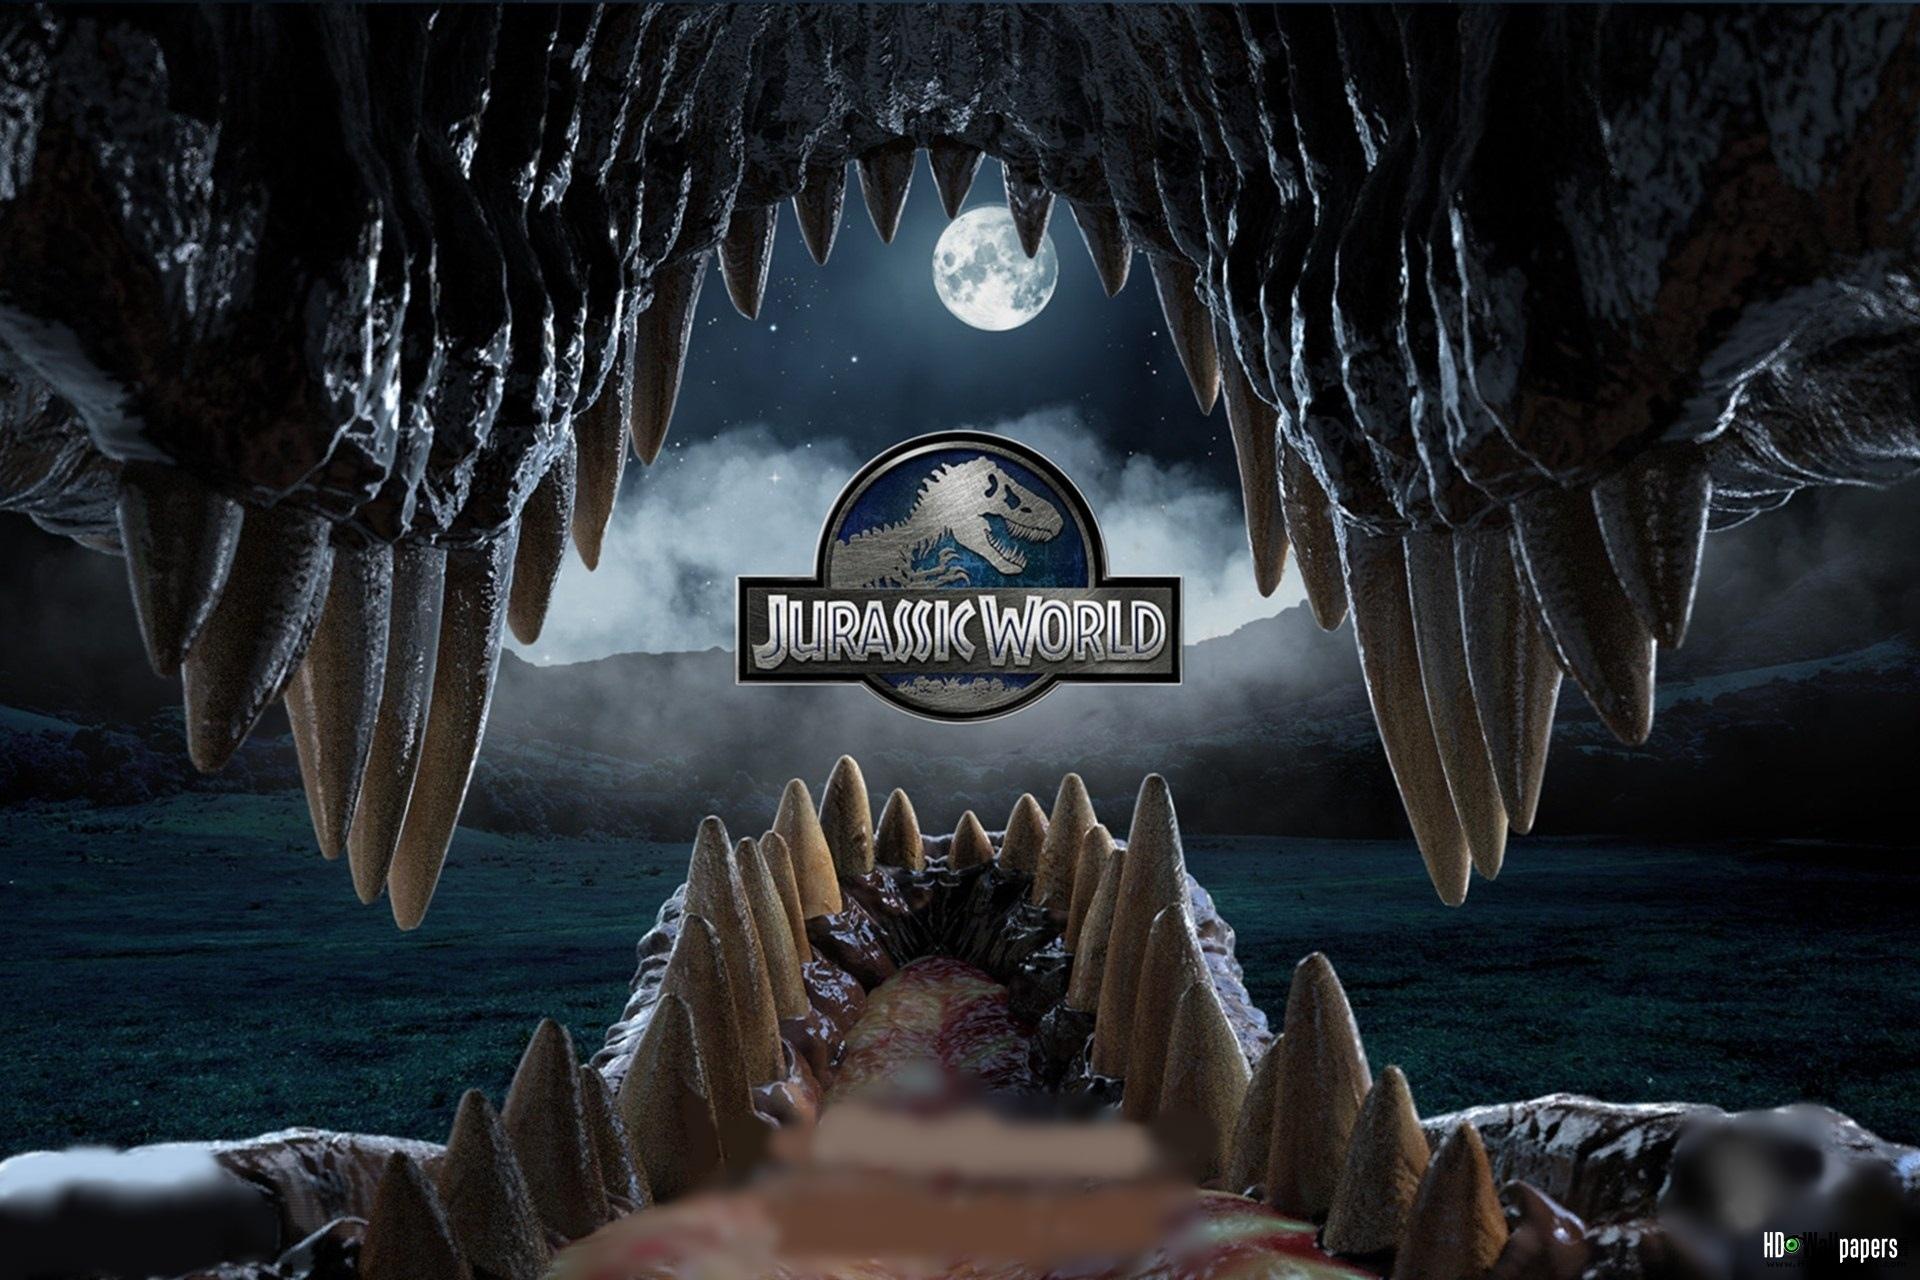 Jurassic_World_2015_-_1920x1280.jpg